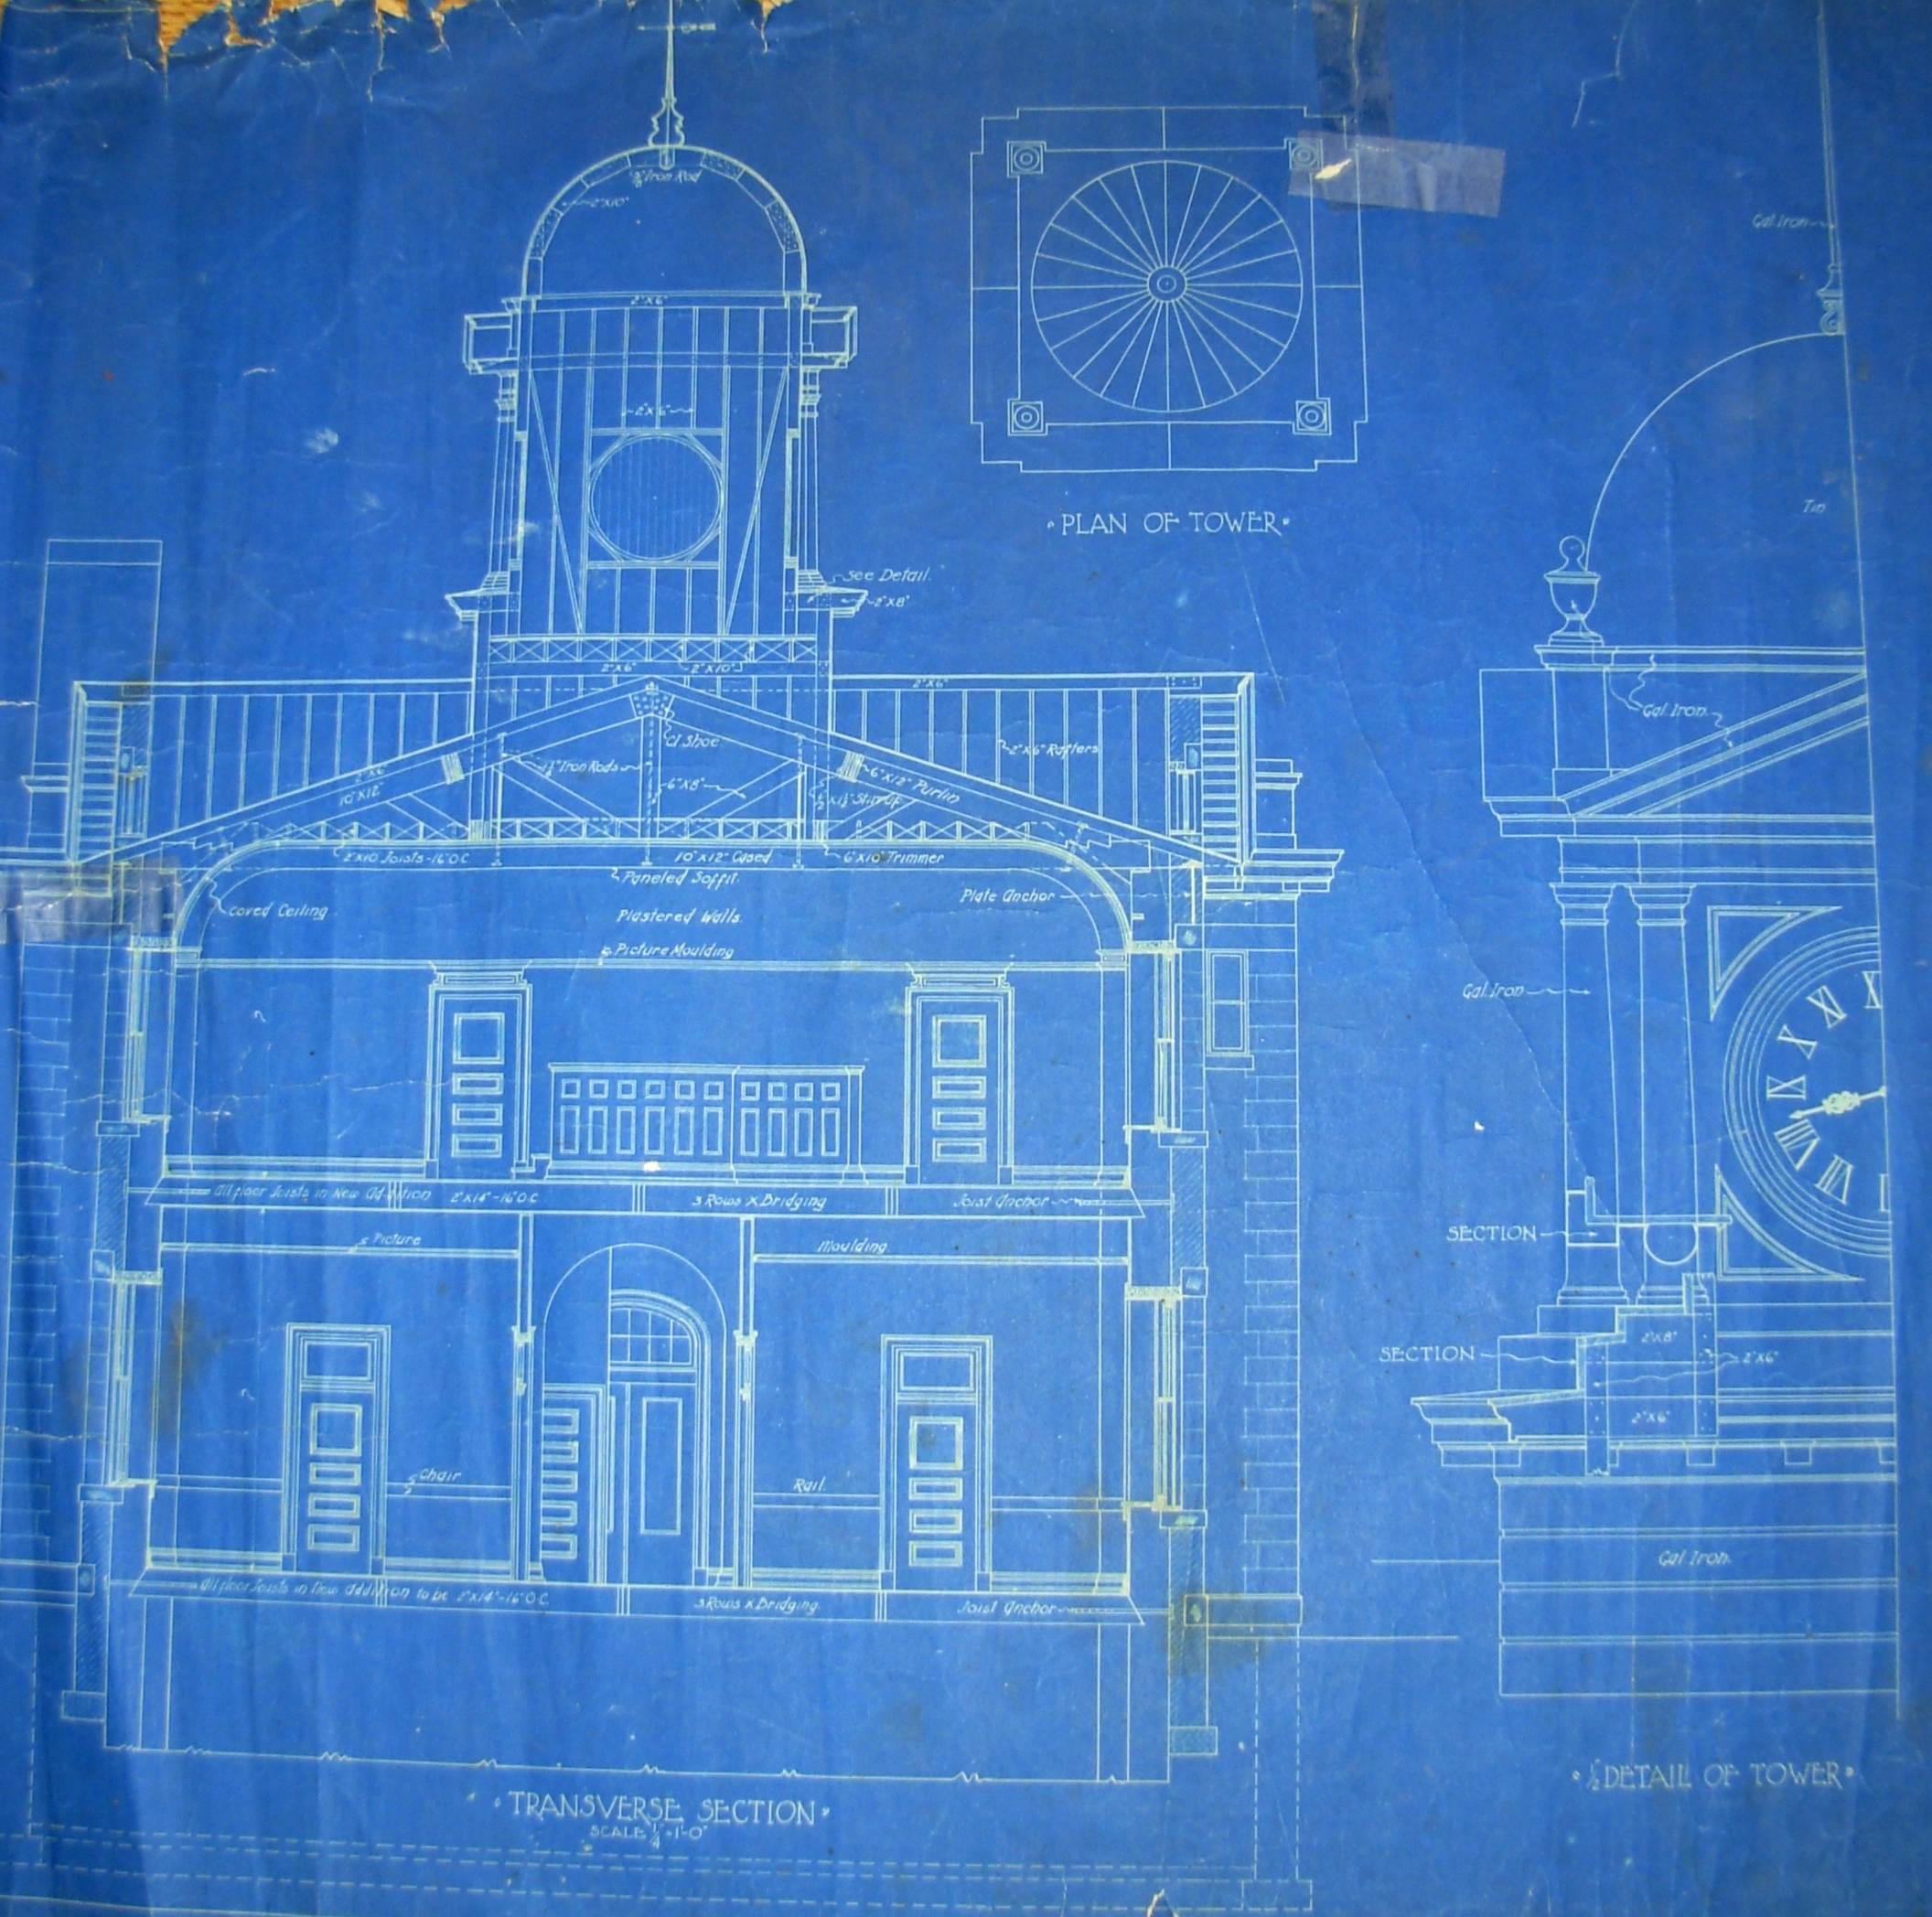 Http Galleryhip Com Church Blueprints Html